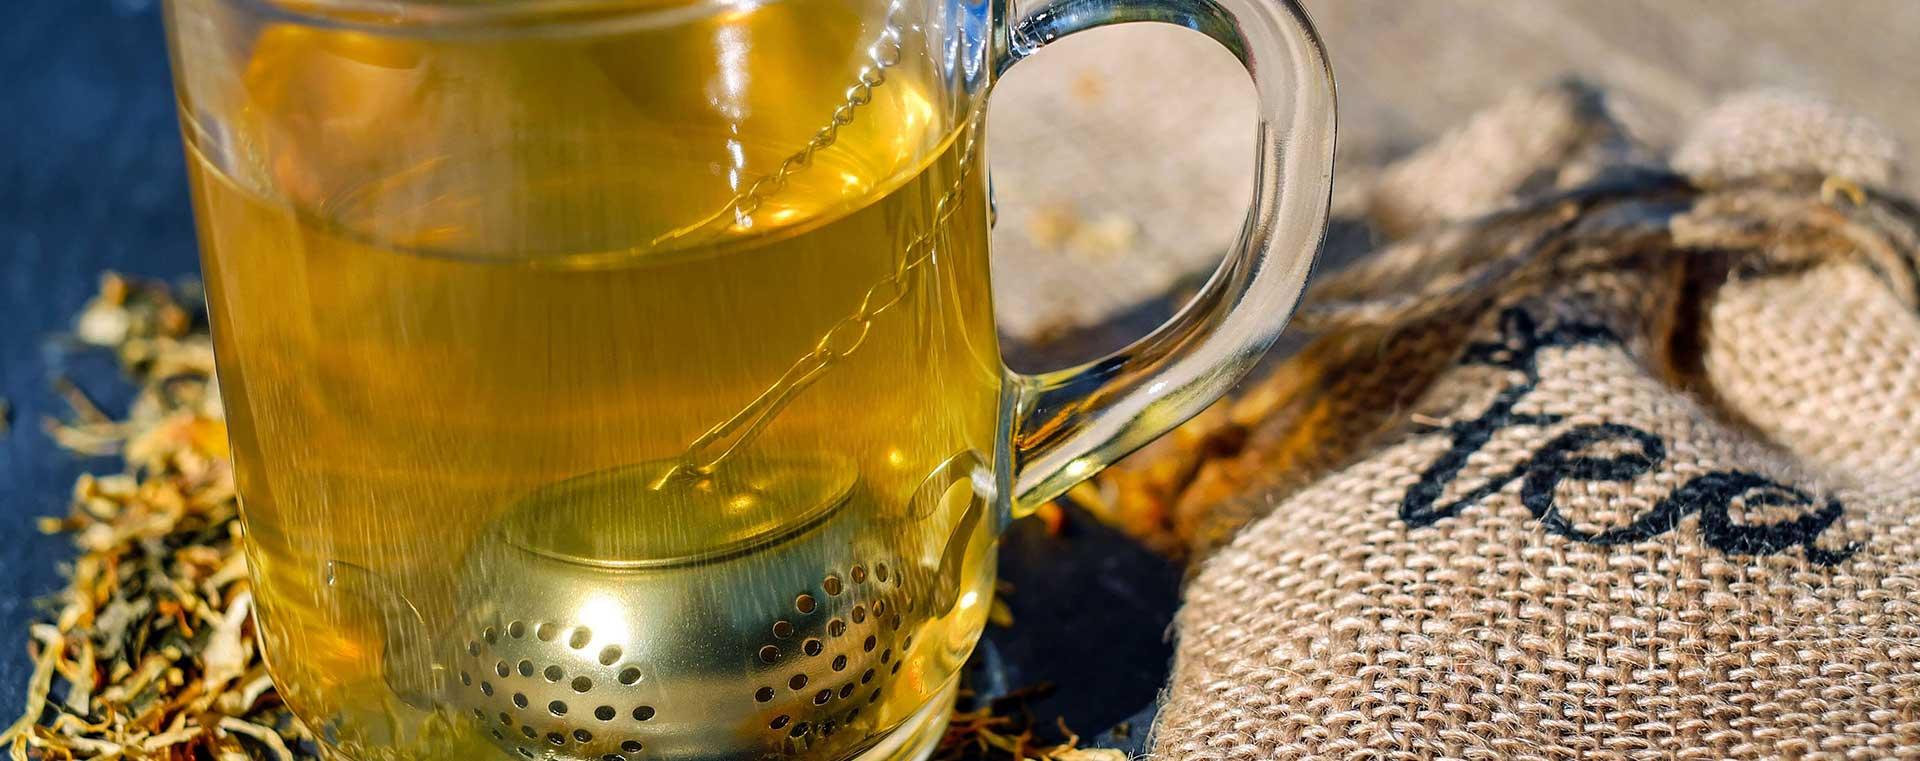 clear-glass-loose-leaf-tea-sack